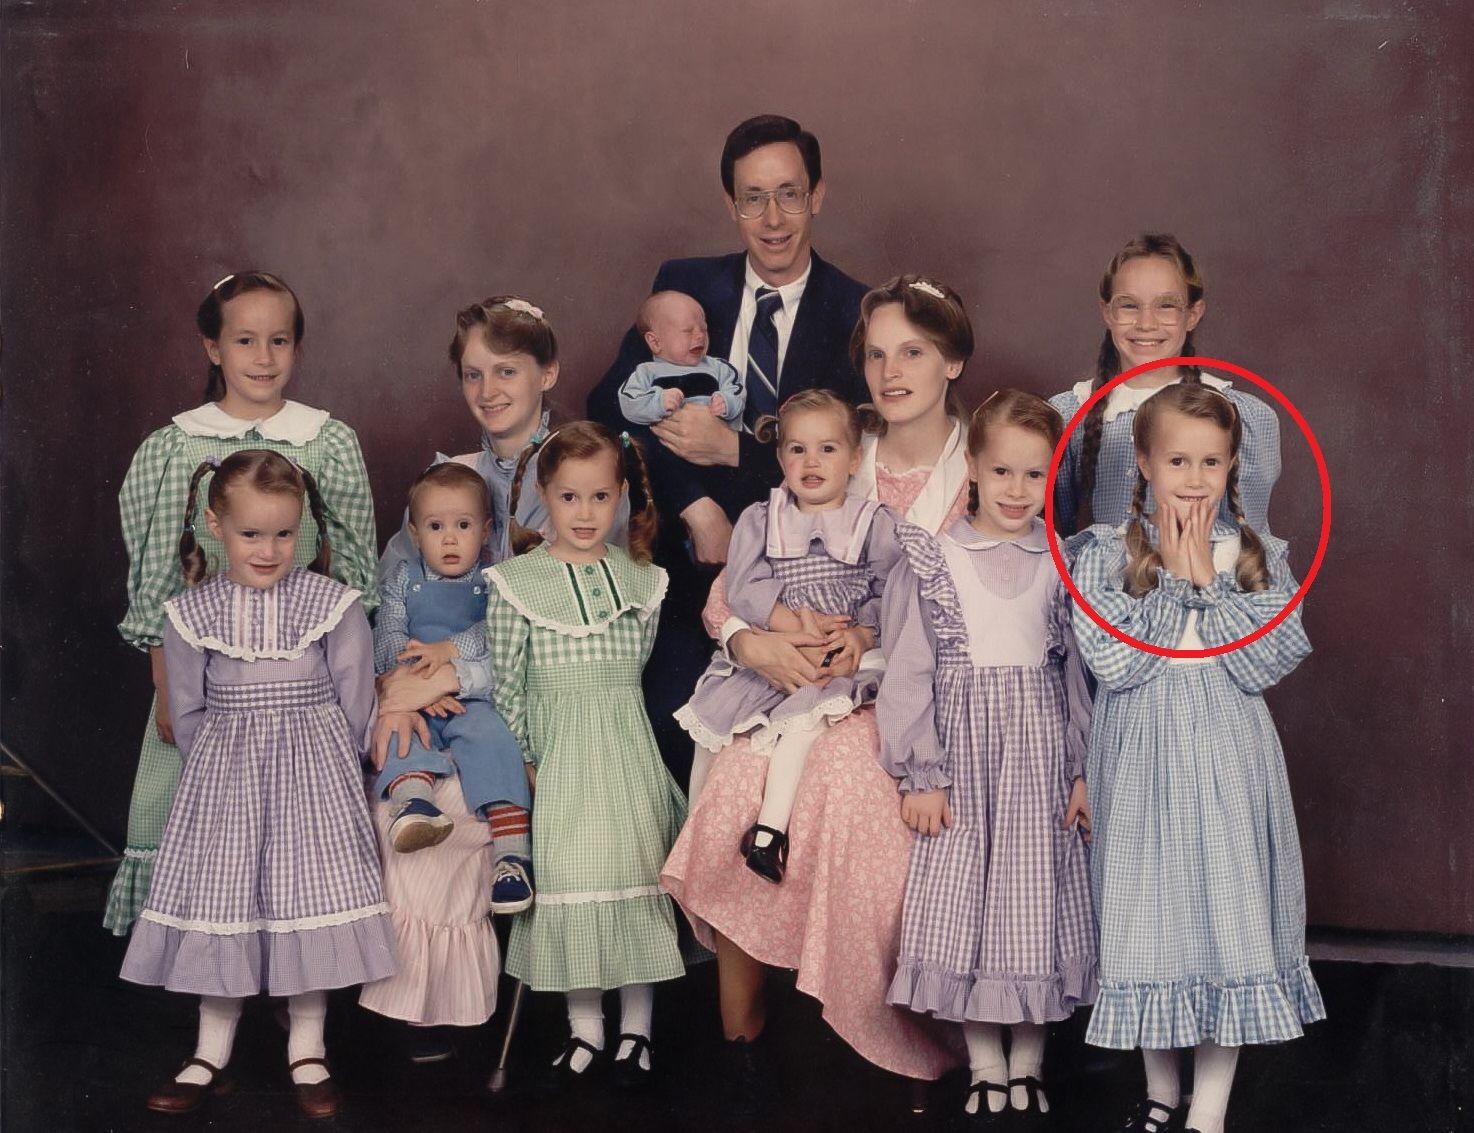 jeffsfamily1992